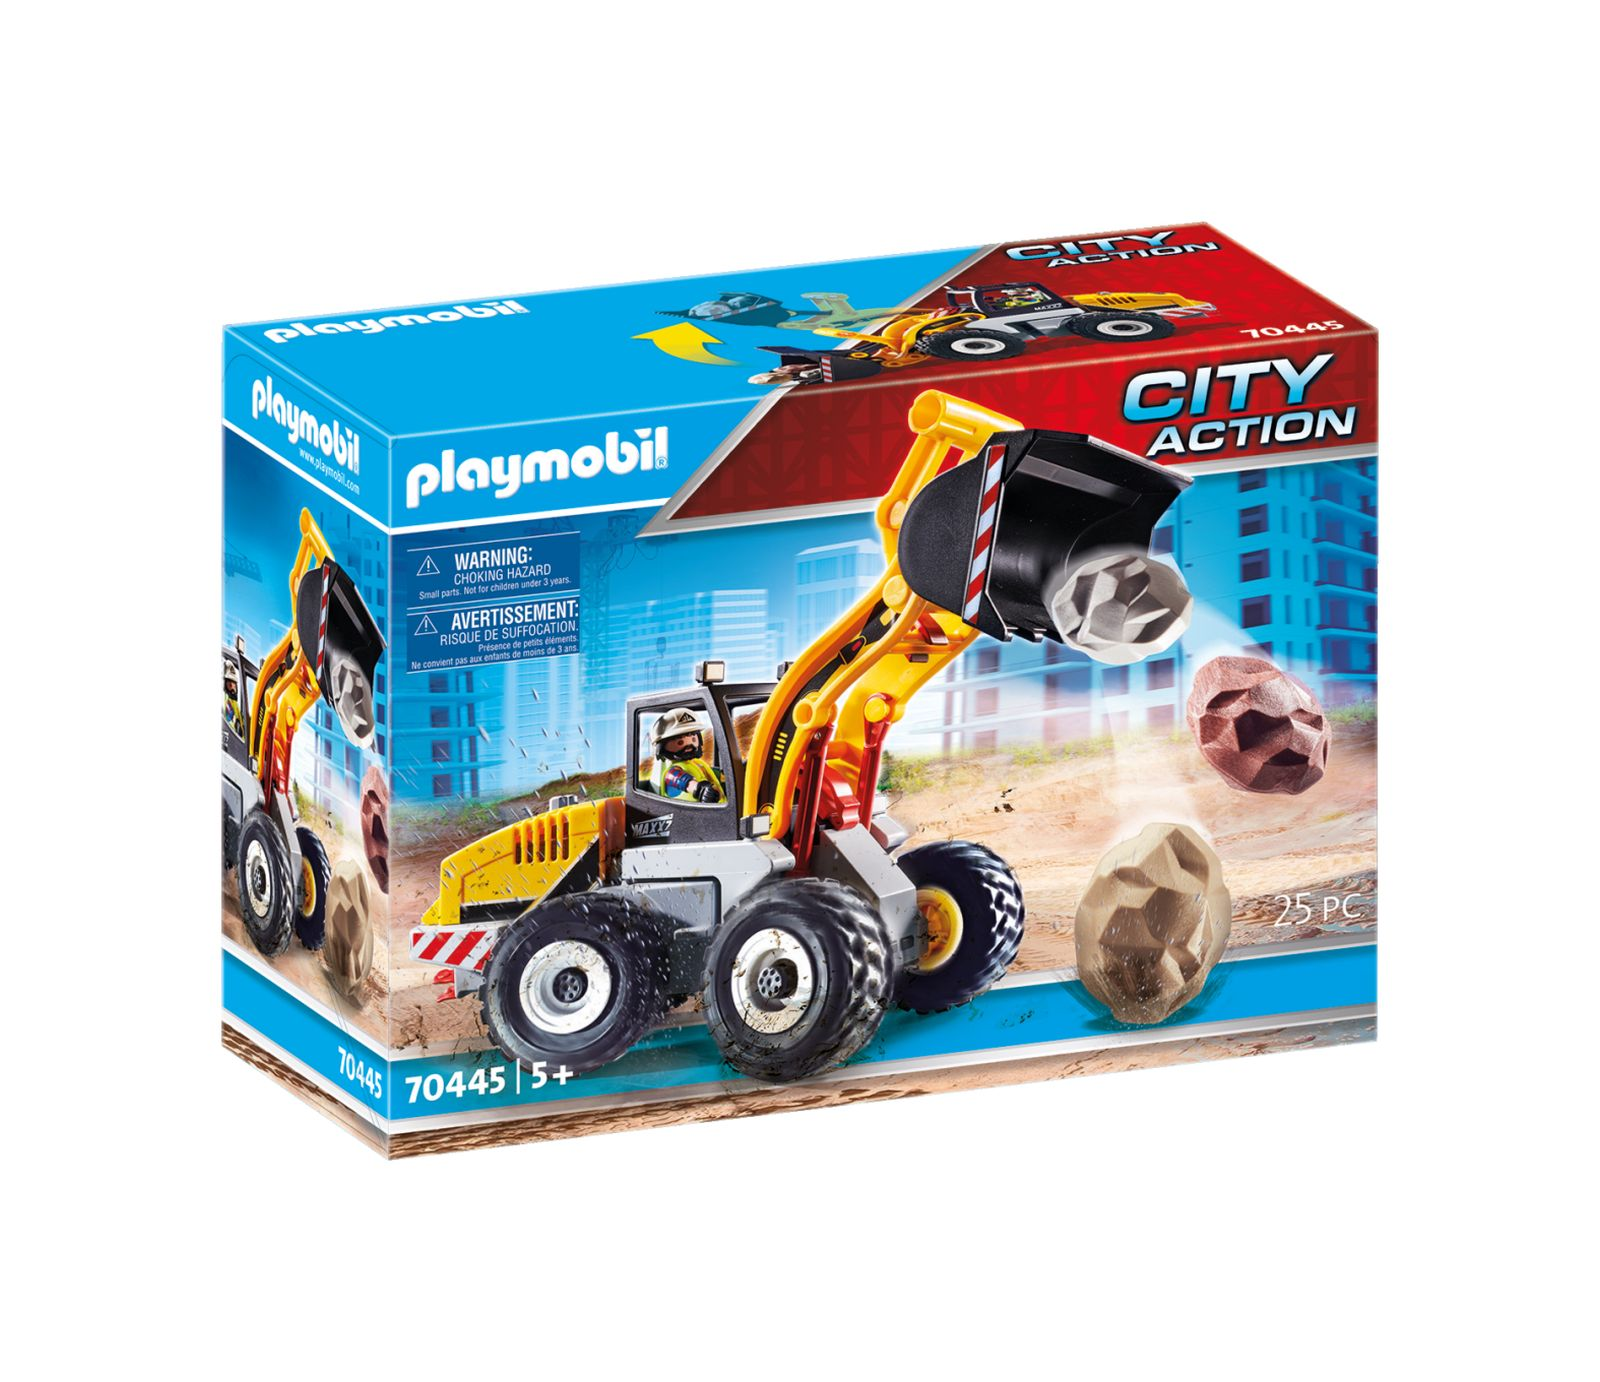 Ruspa - Playmobil